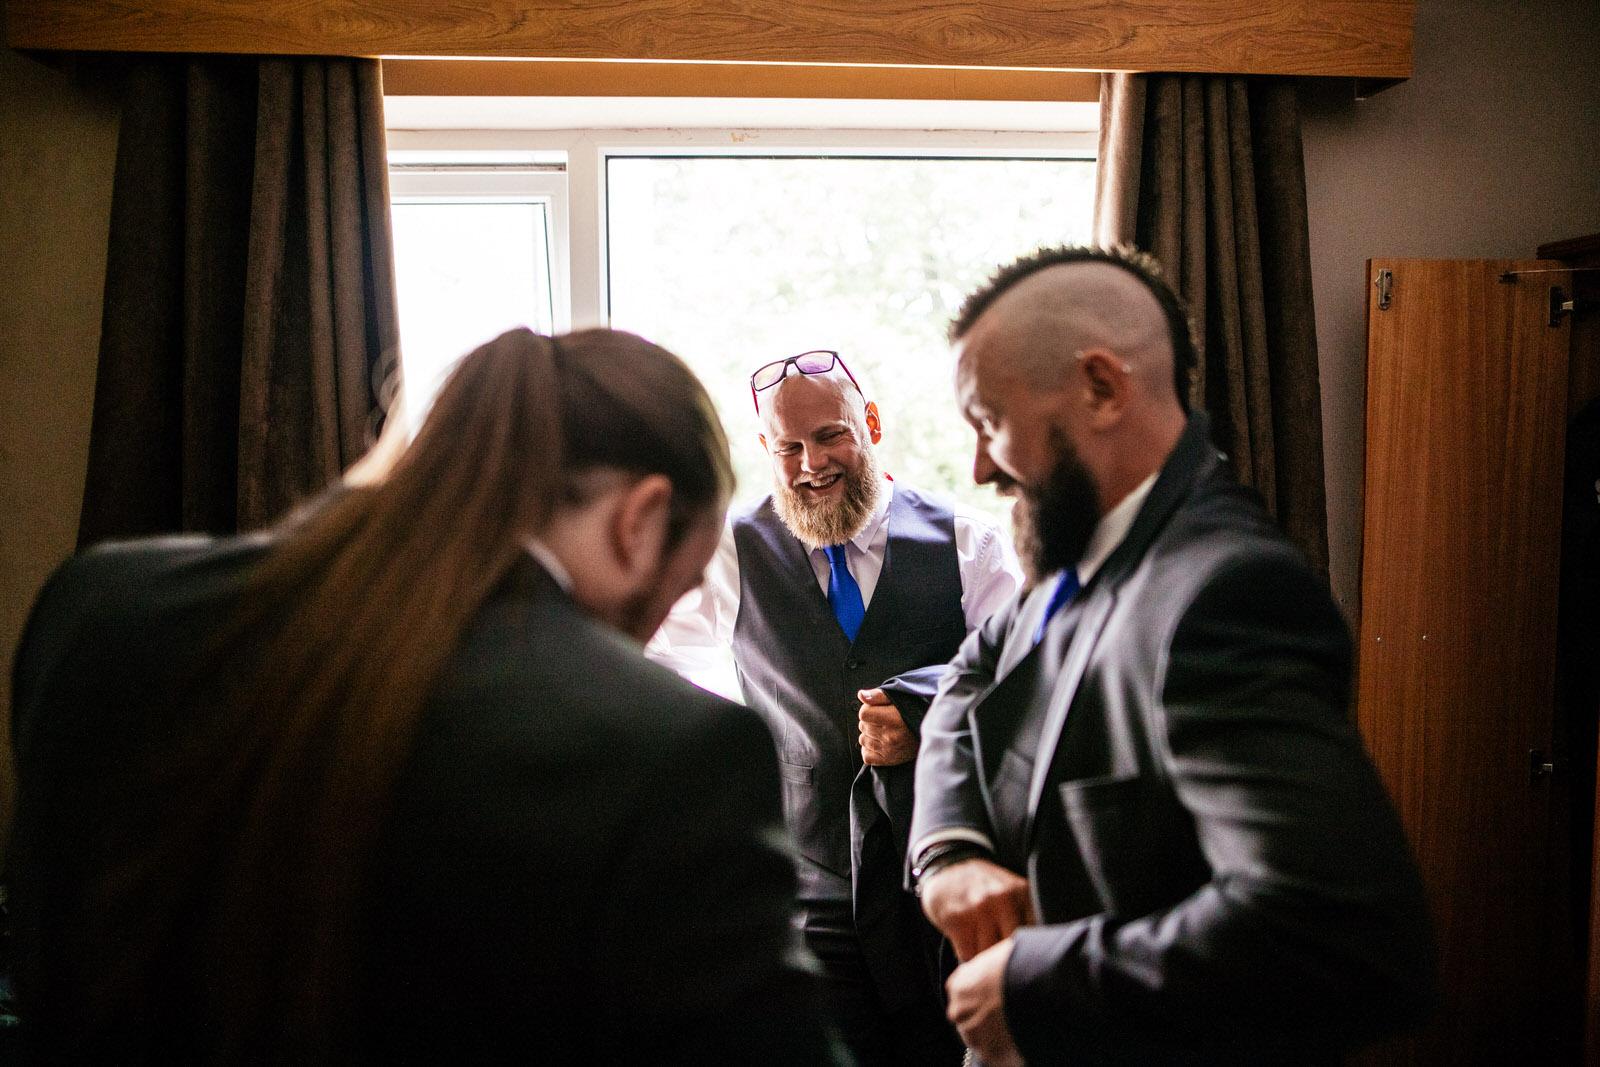 Carmel-and-Dan-Wedding-Highlights-4.jpg